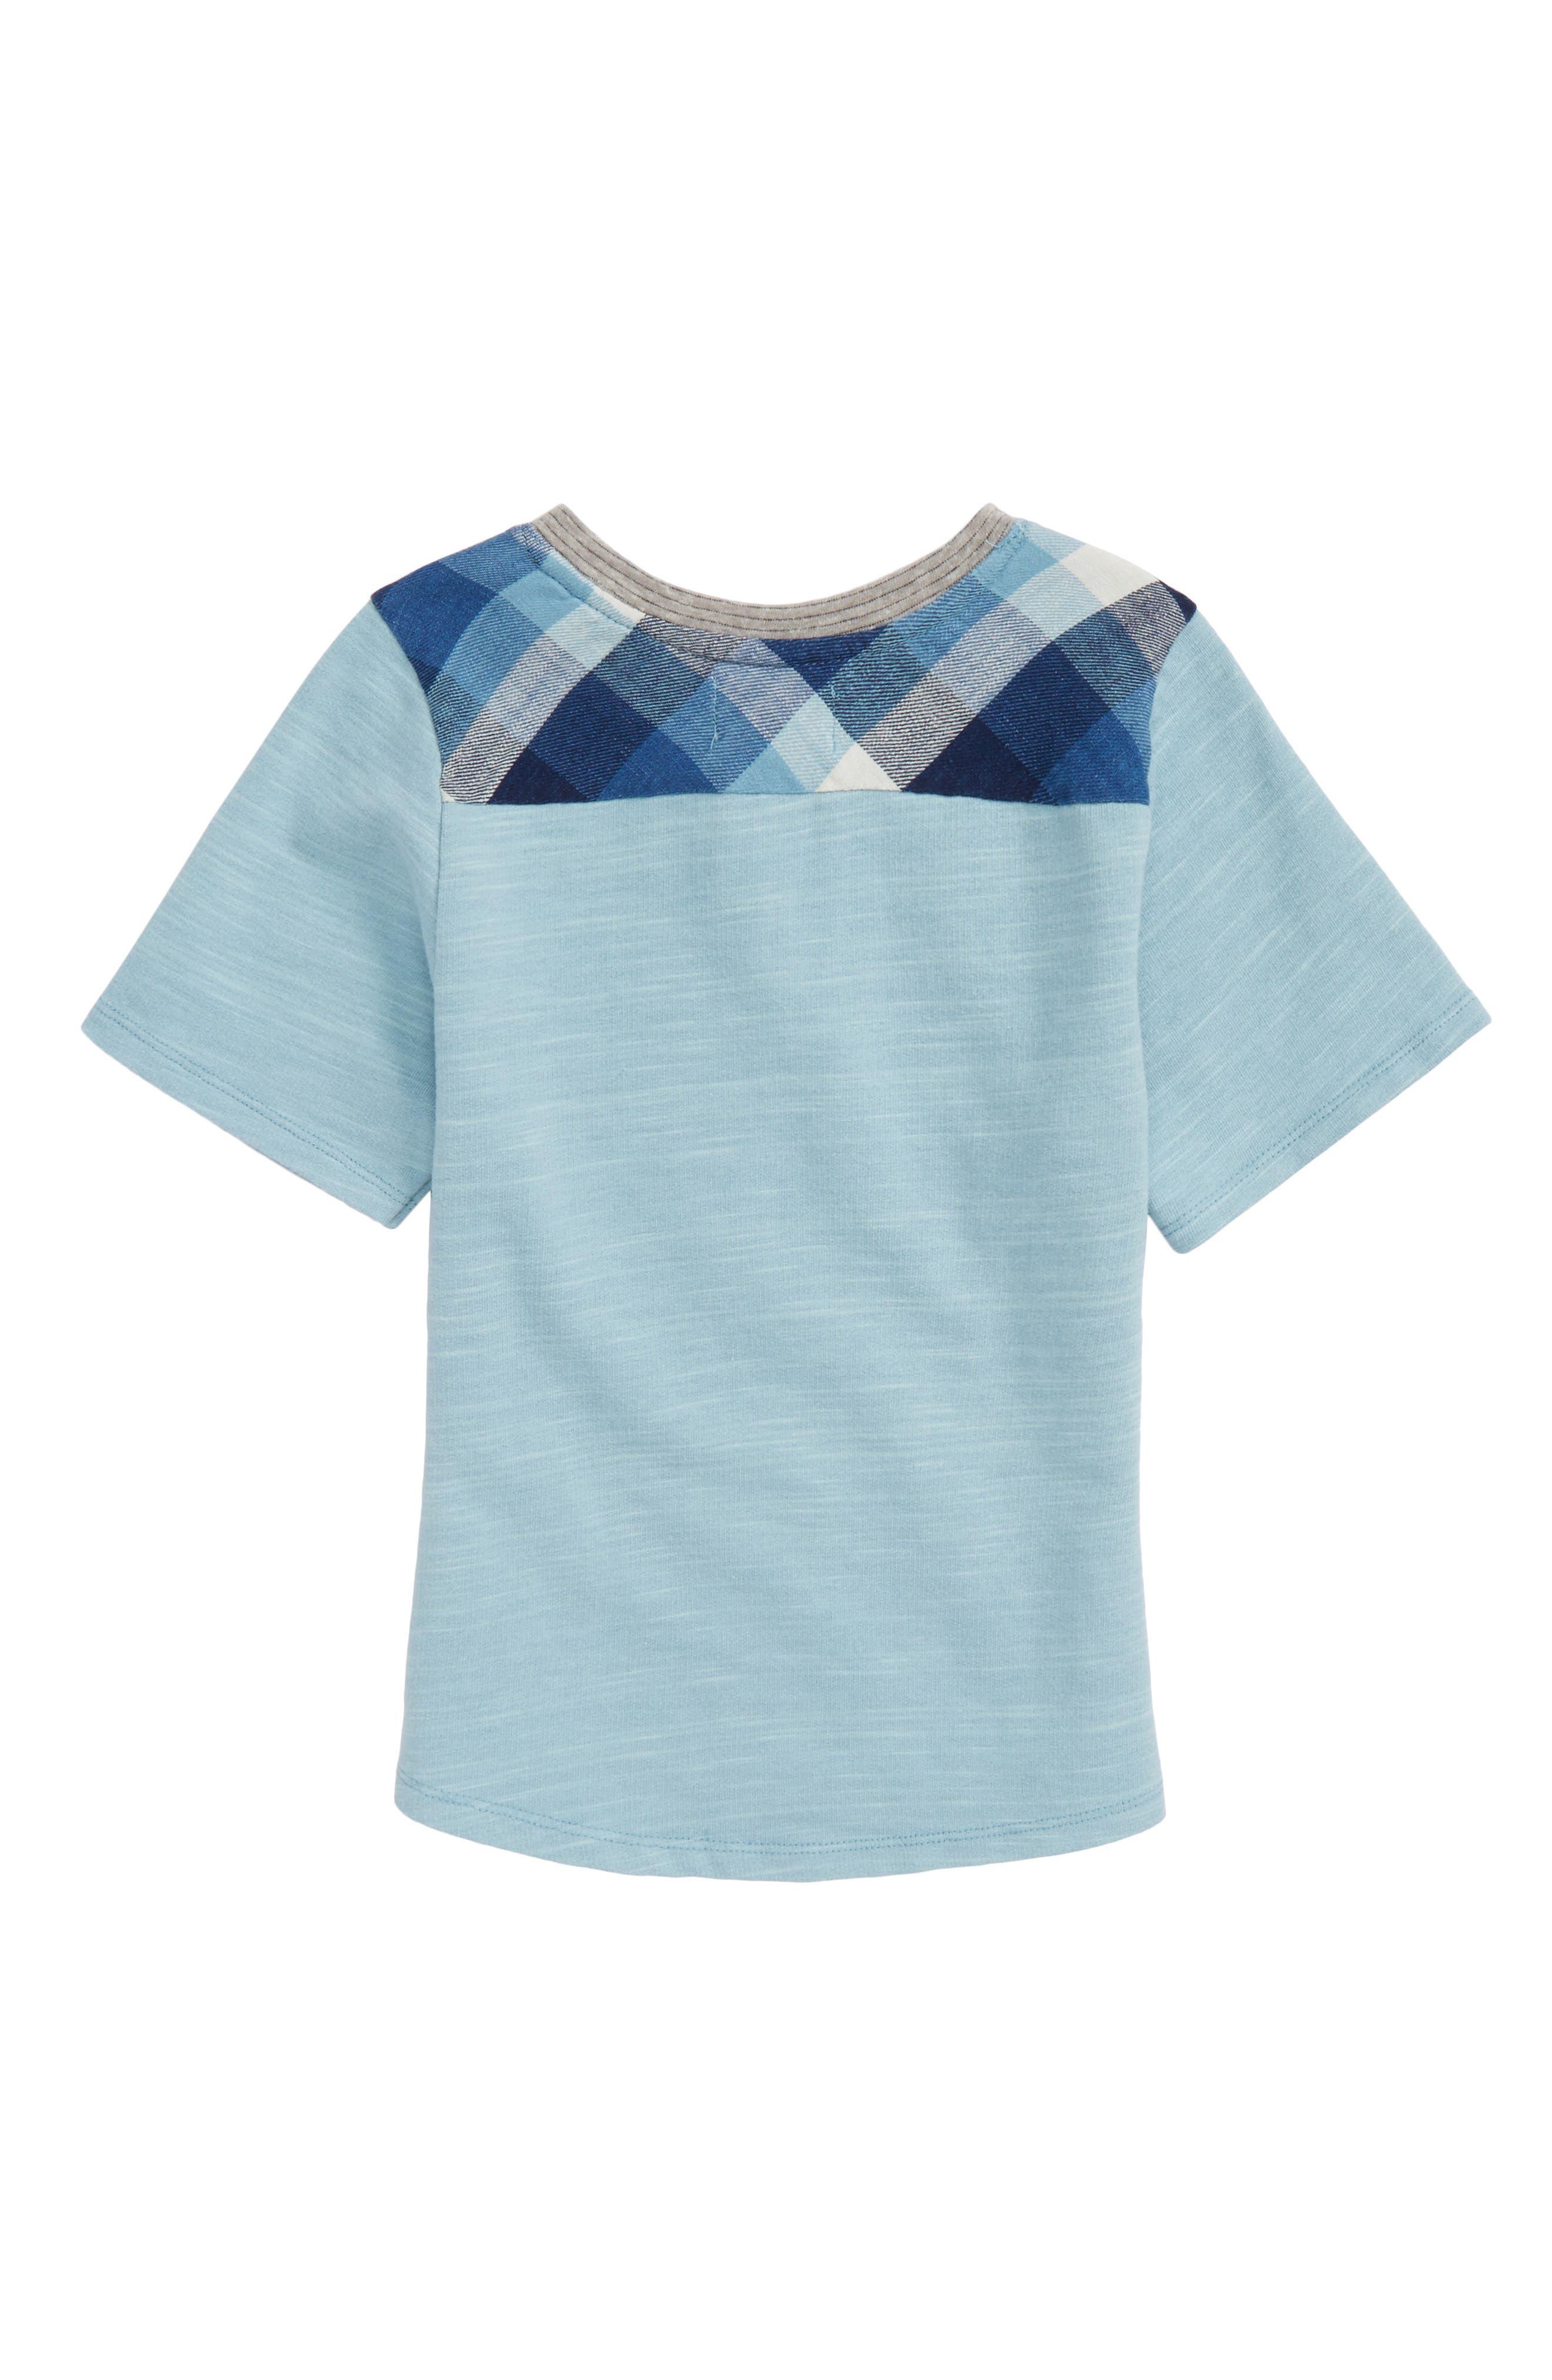 Phoenix Henley Shirt,                             Alternate thumbnail 2, color,                             020